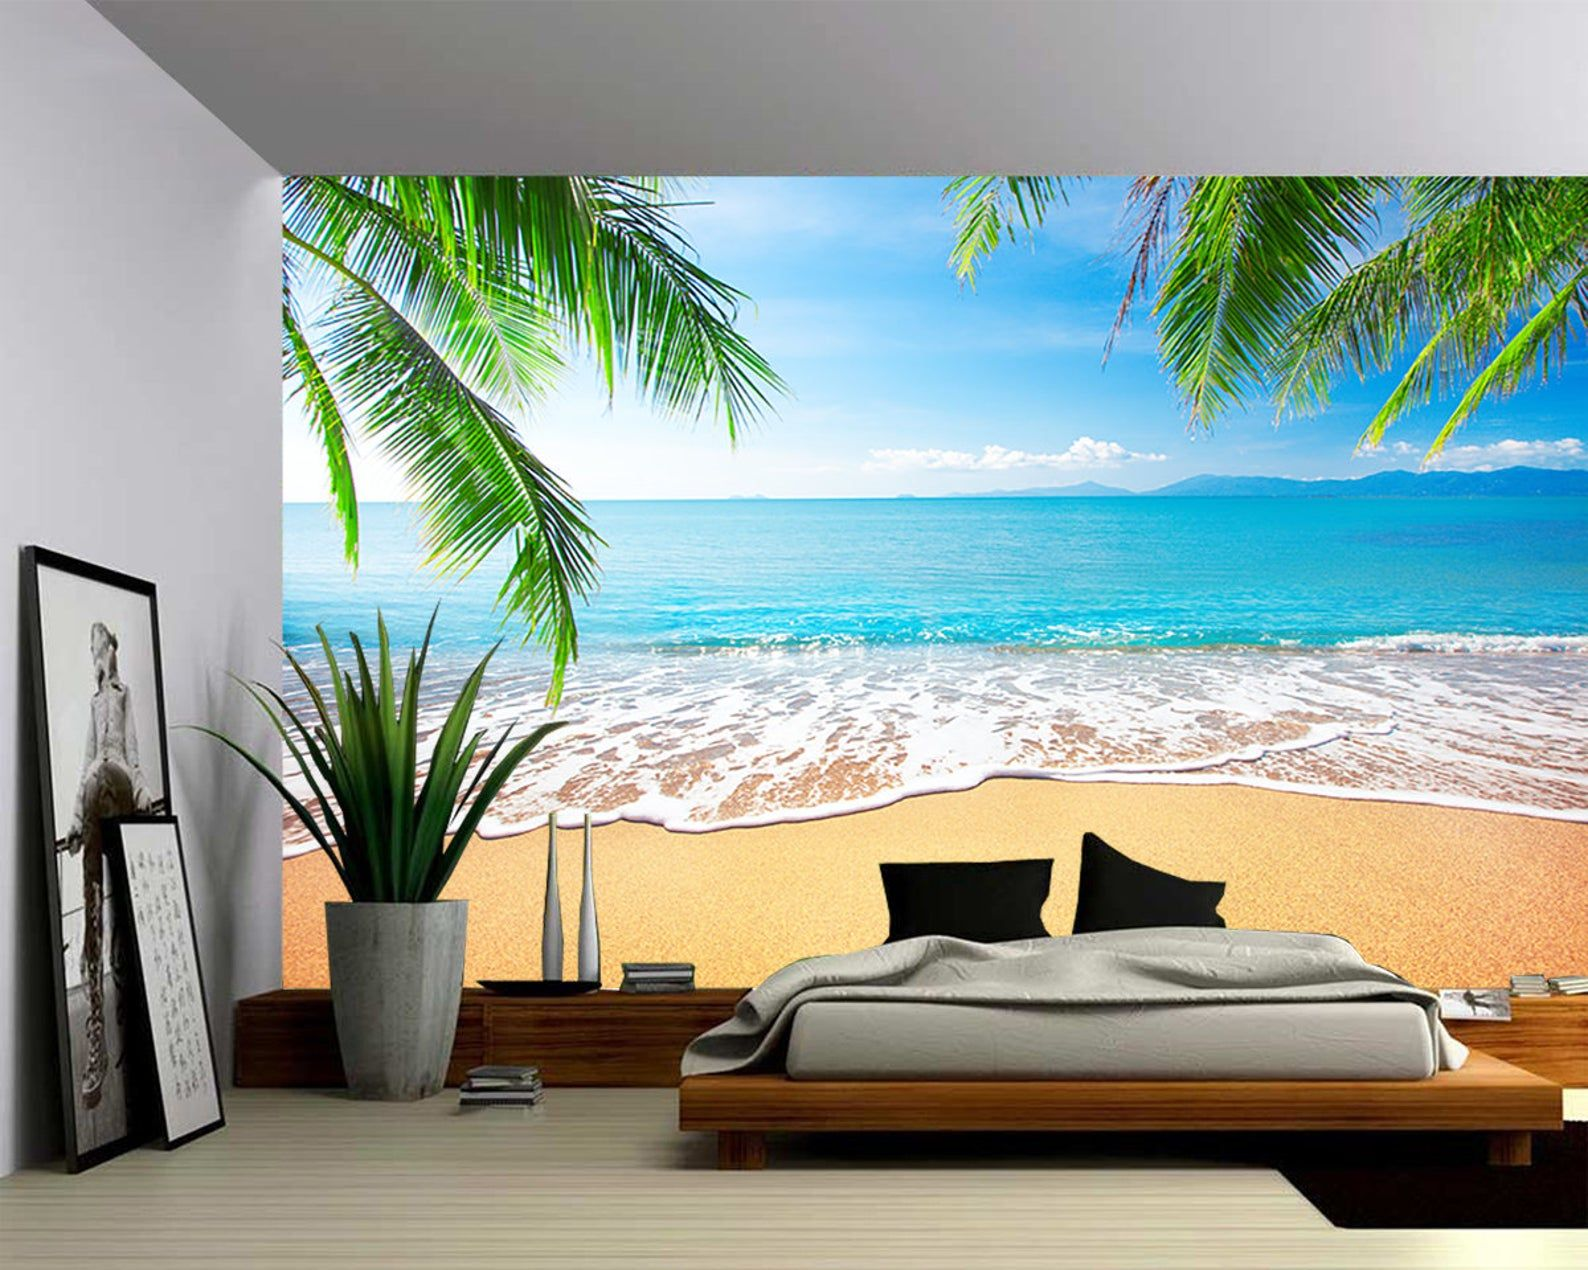 Palm and Tropical Beach Large Wall Mural Selfadhesive